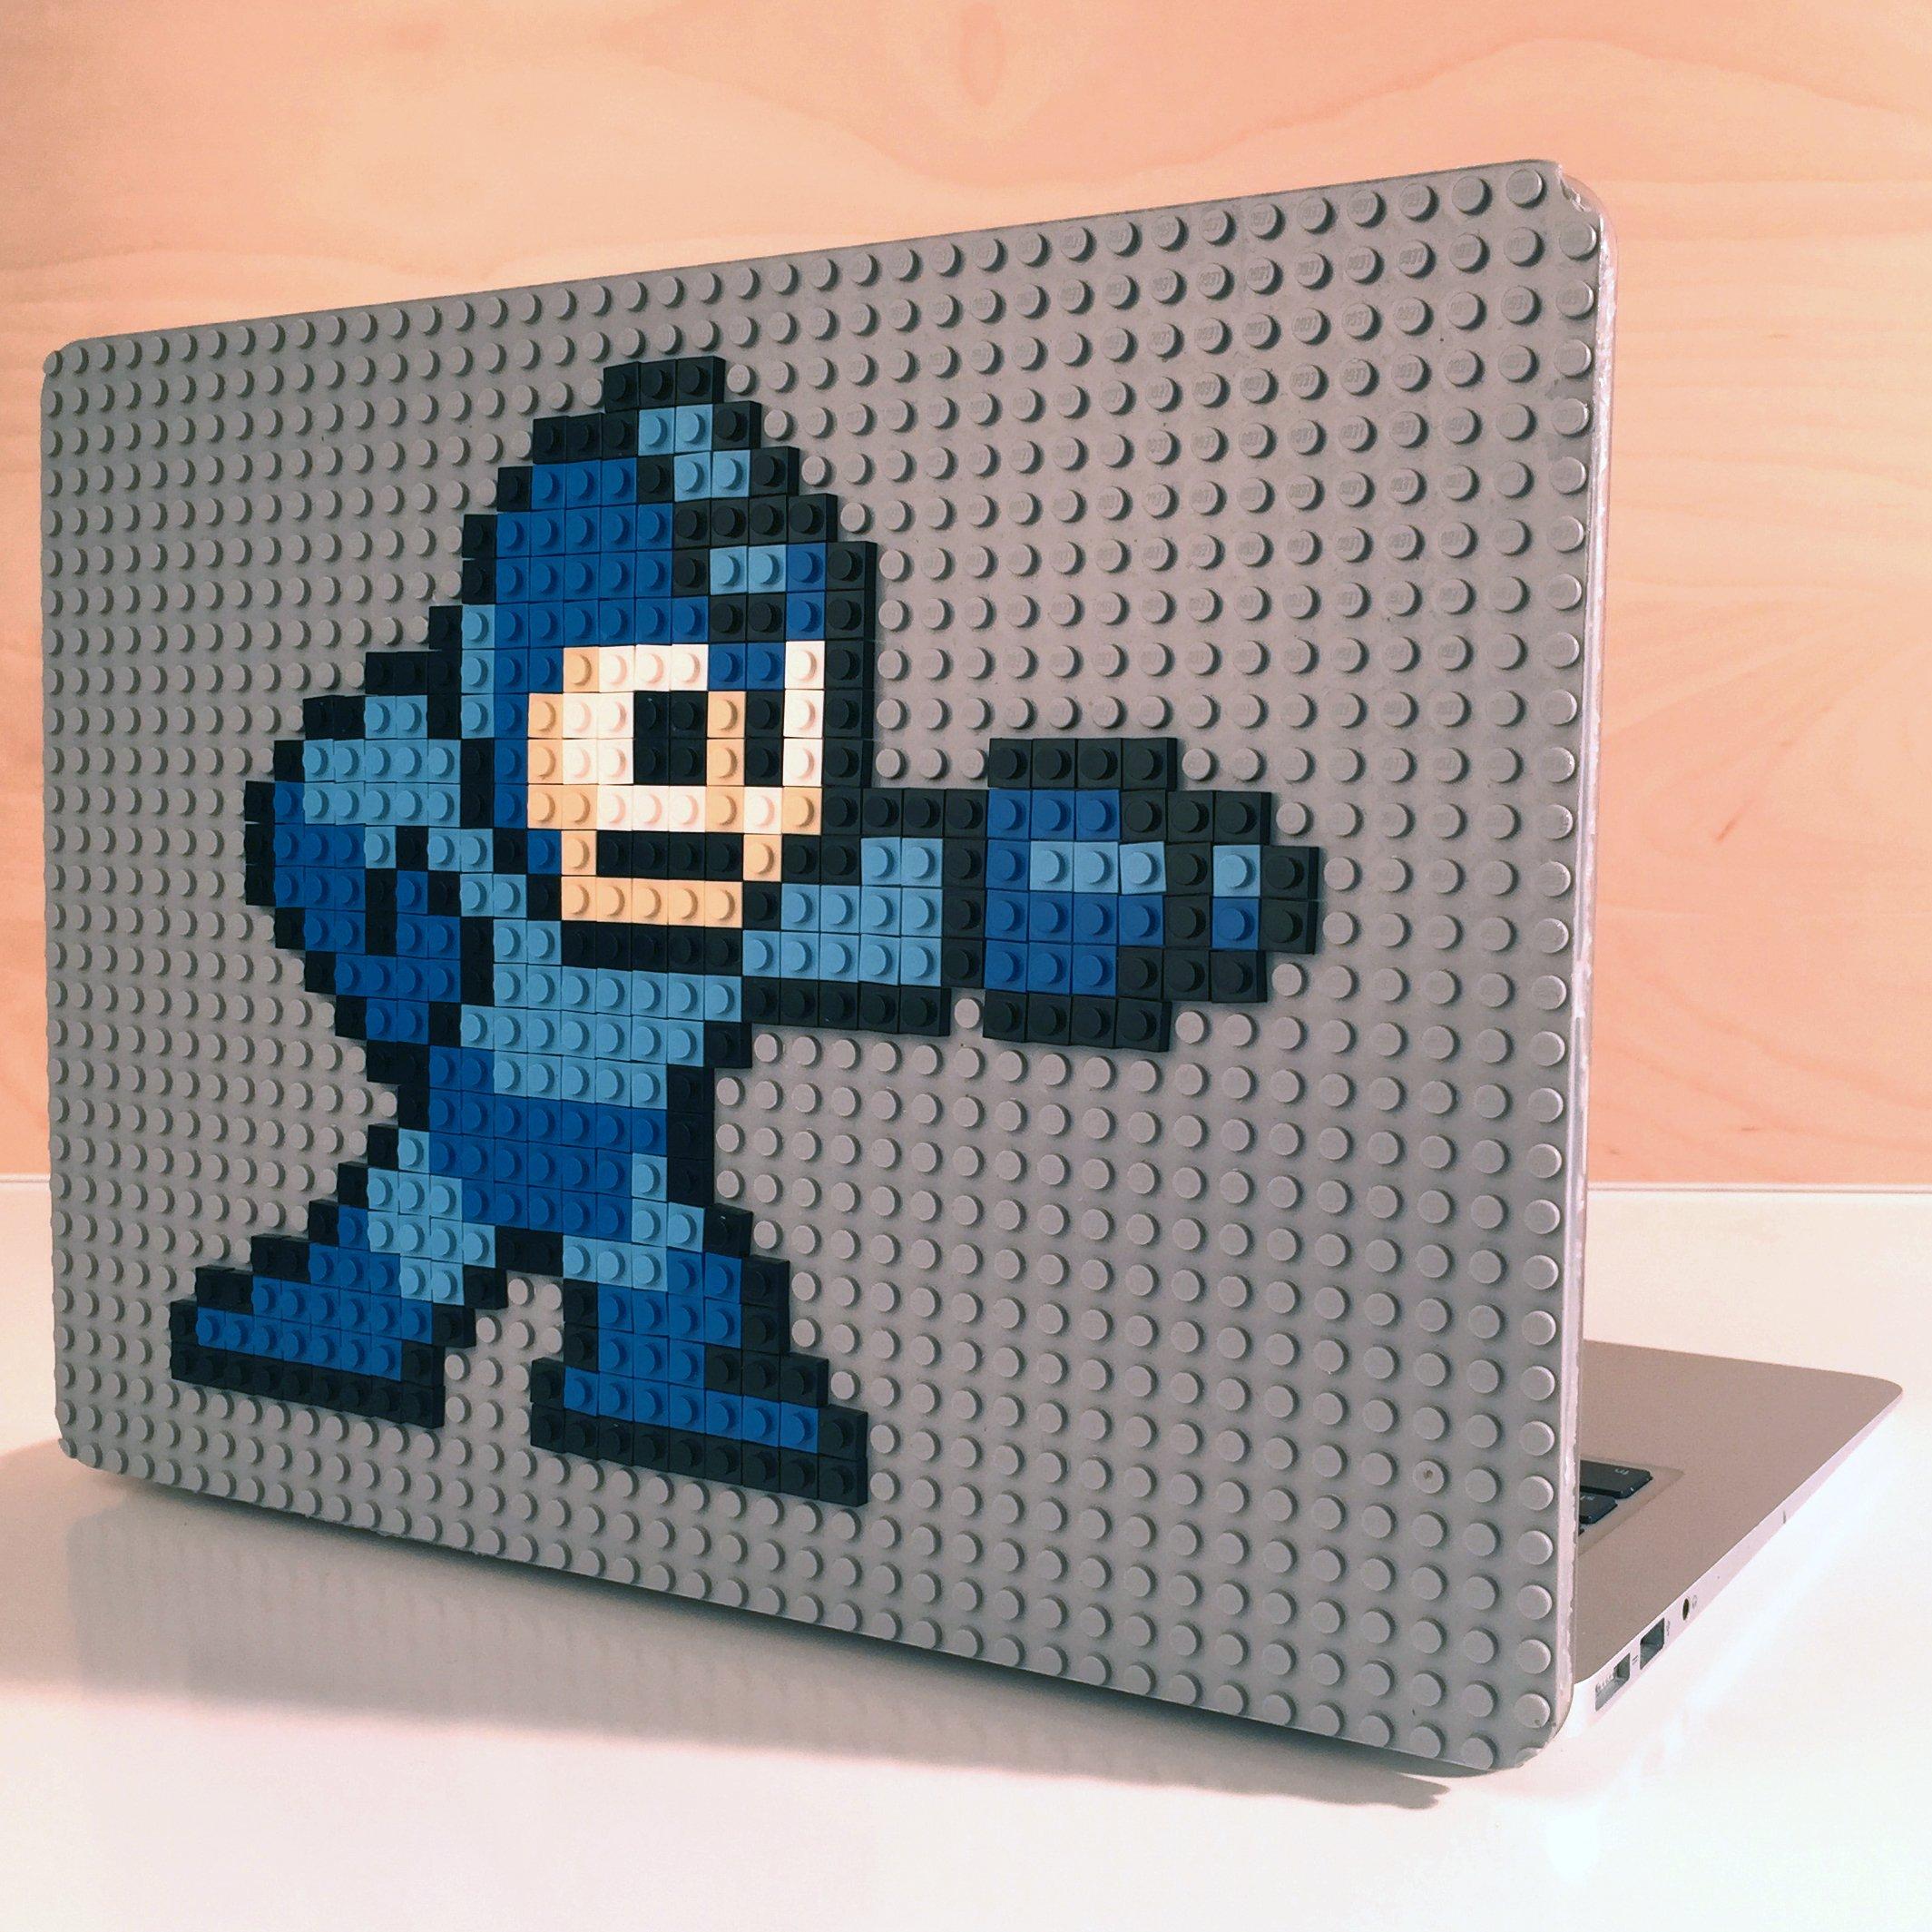 World's First Customizable Macbook Case